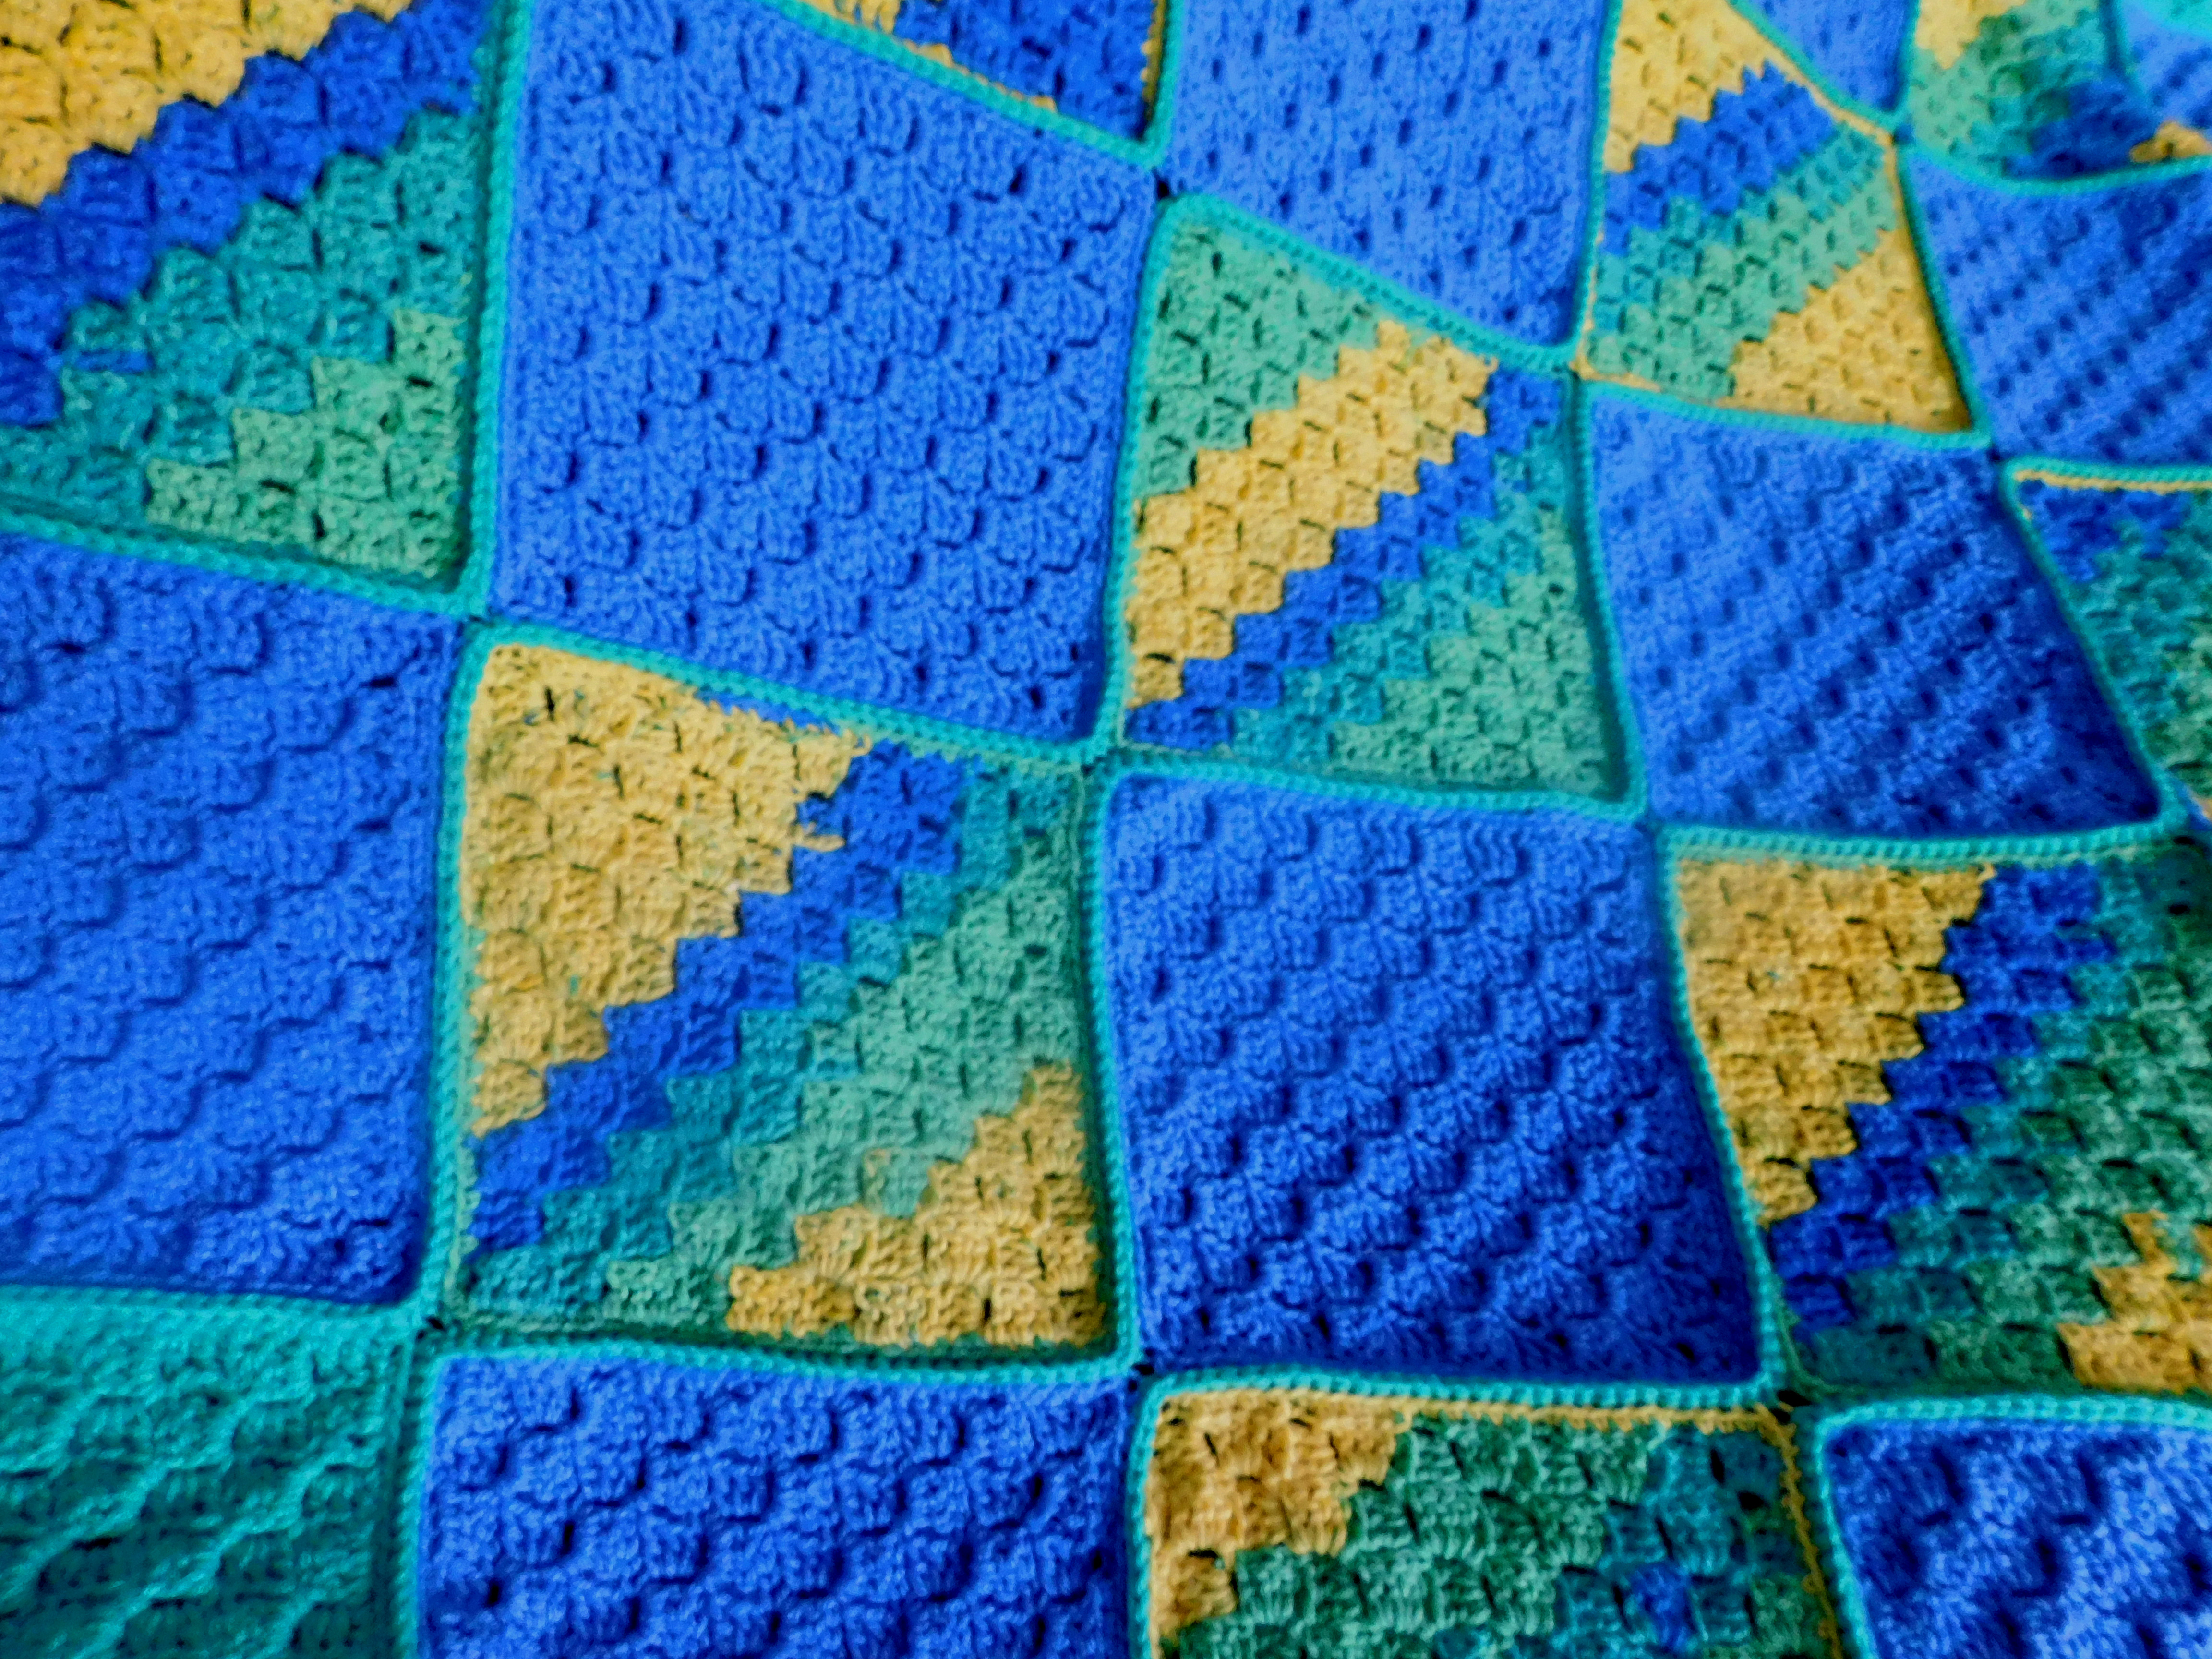 Project Linus Blanket #36 Detail